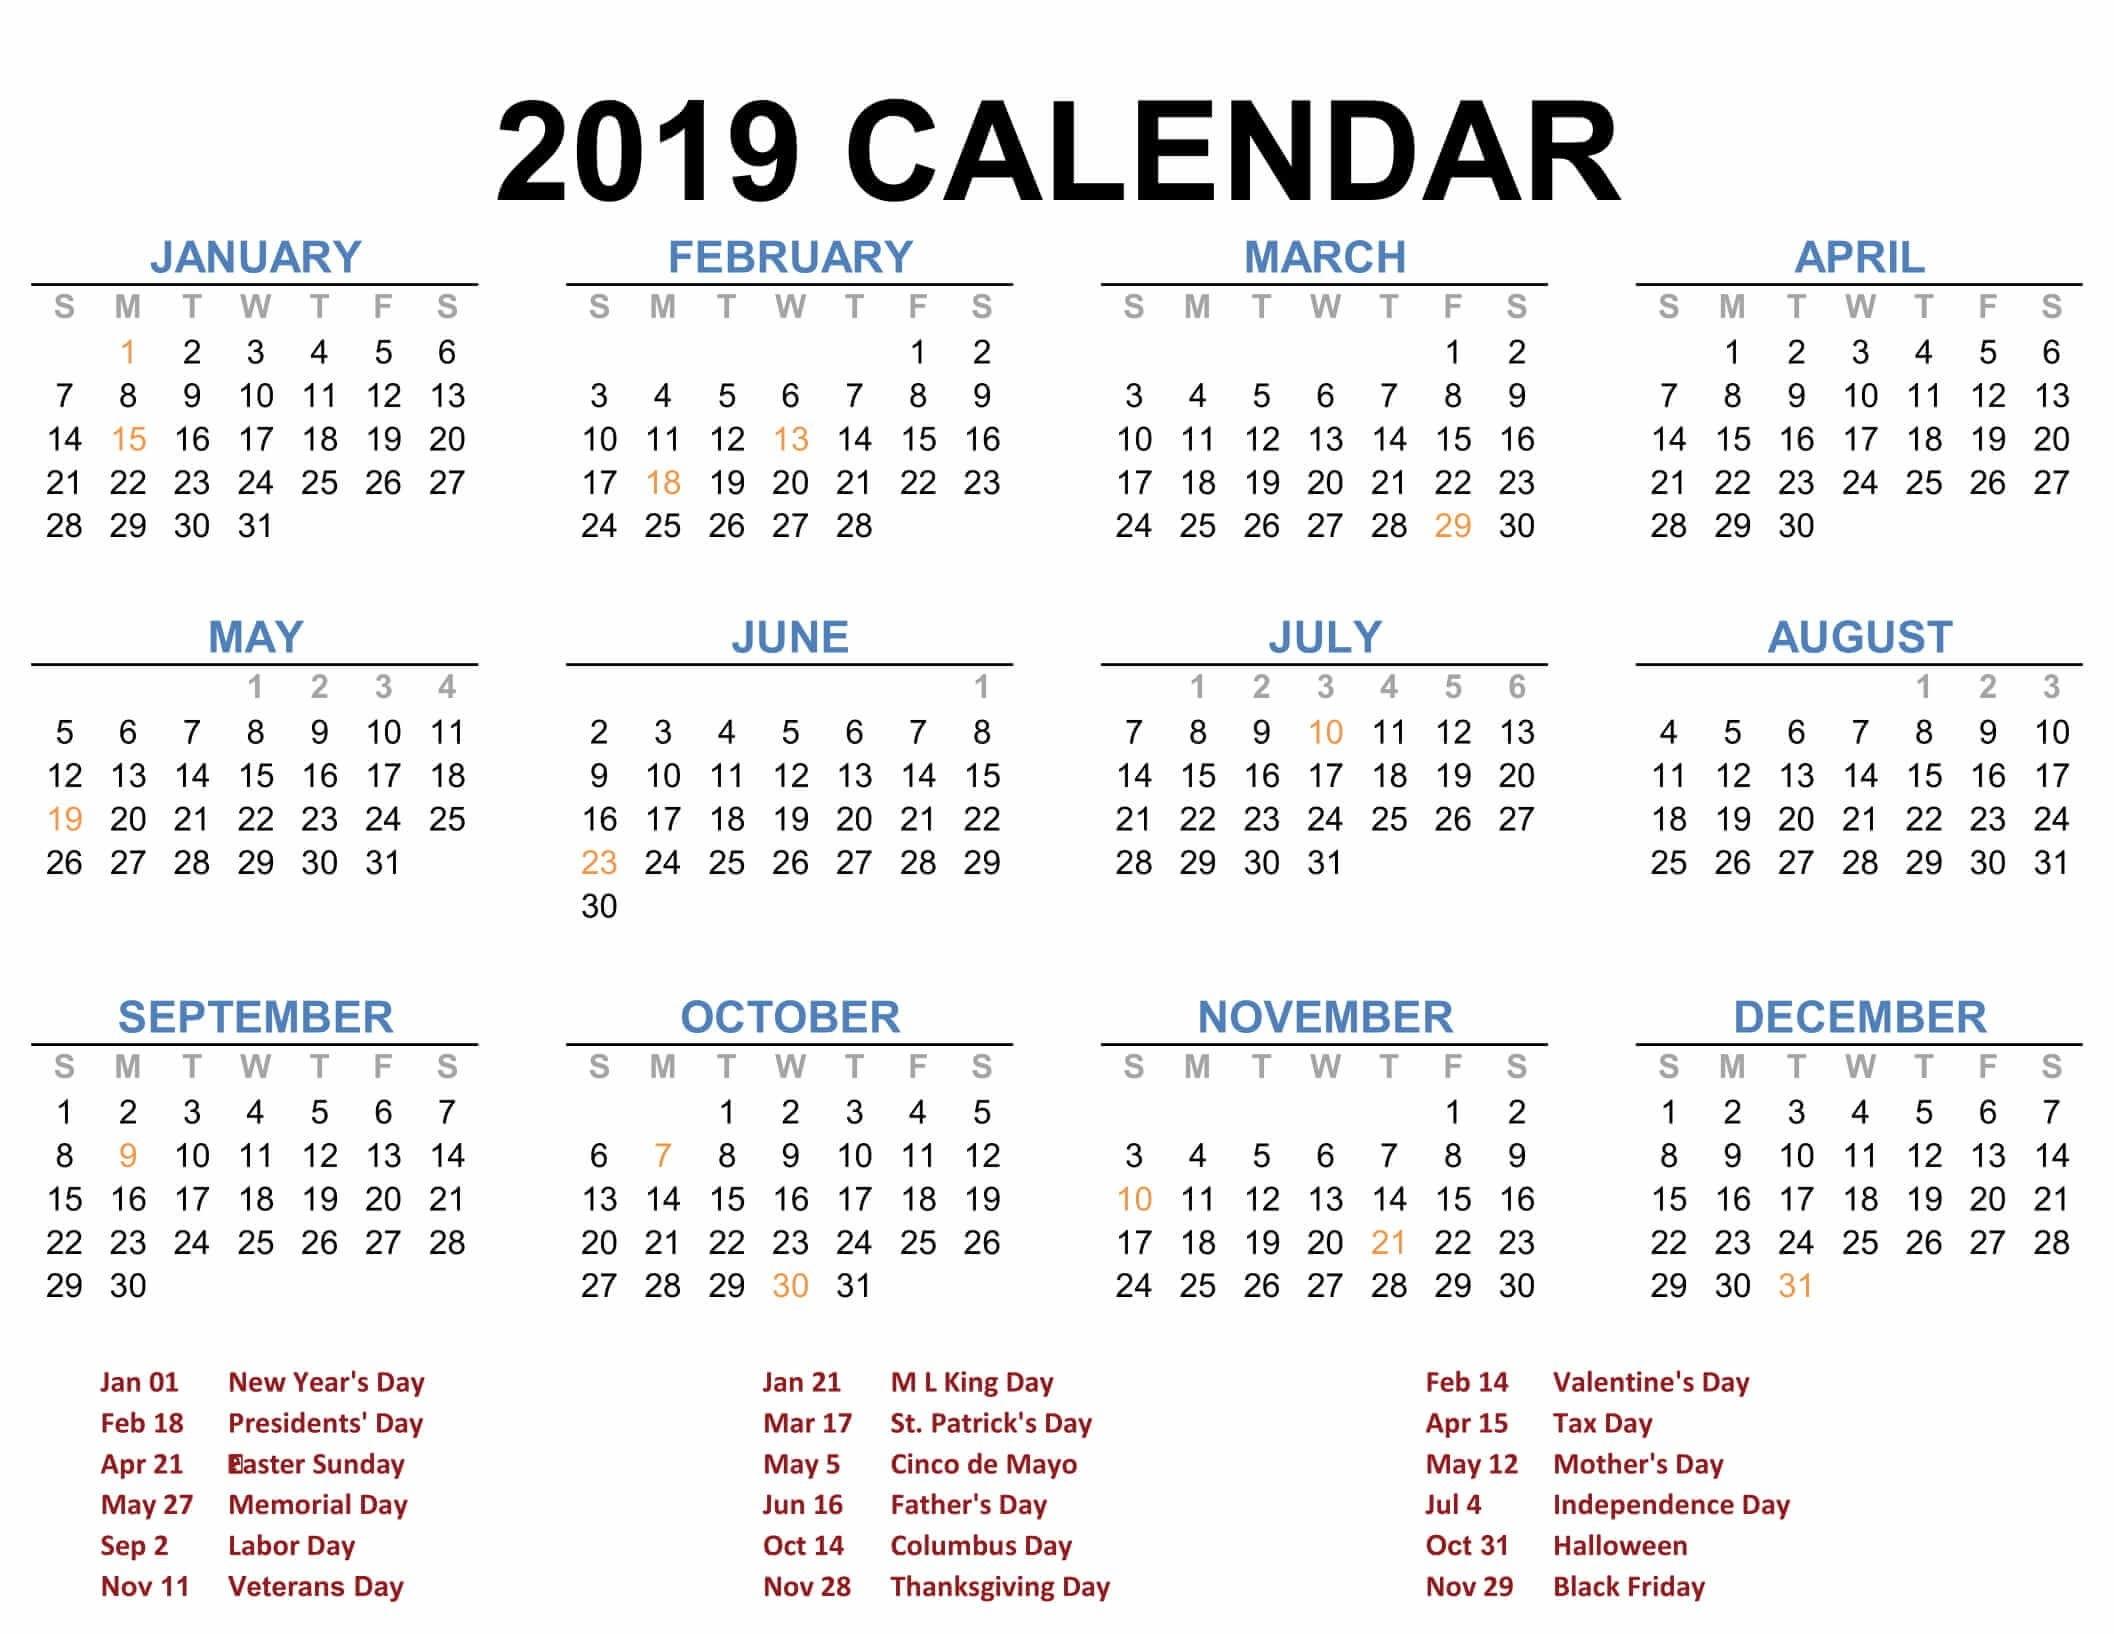 Printable Blank 2019 Calendar Templates – Calenndar Calendar 4 2019